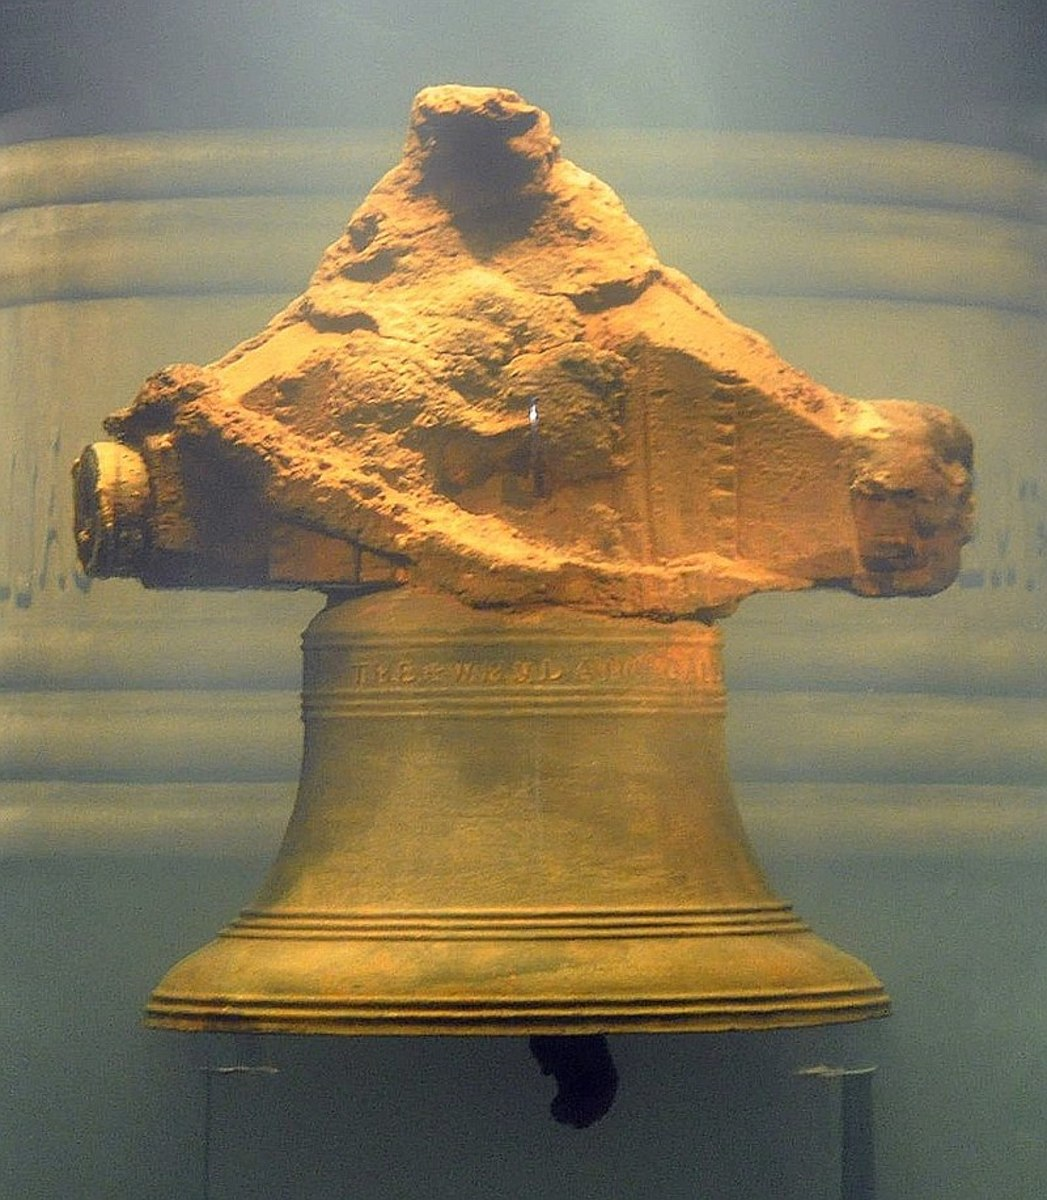 Bell of the Whydah